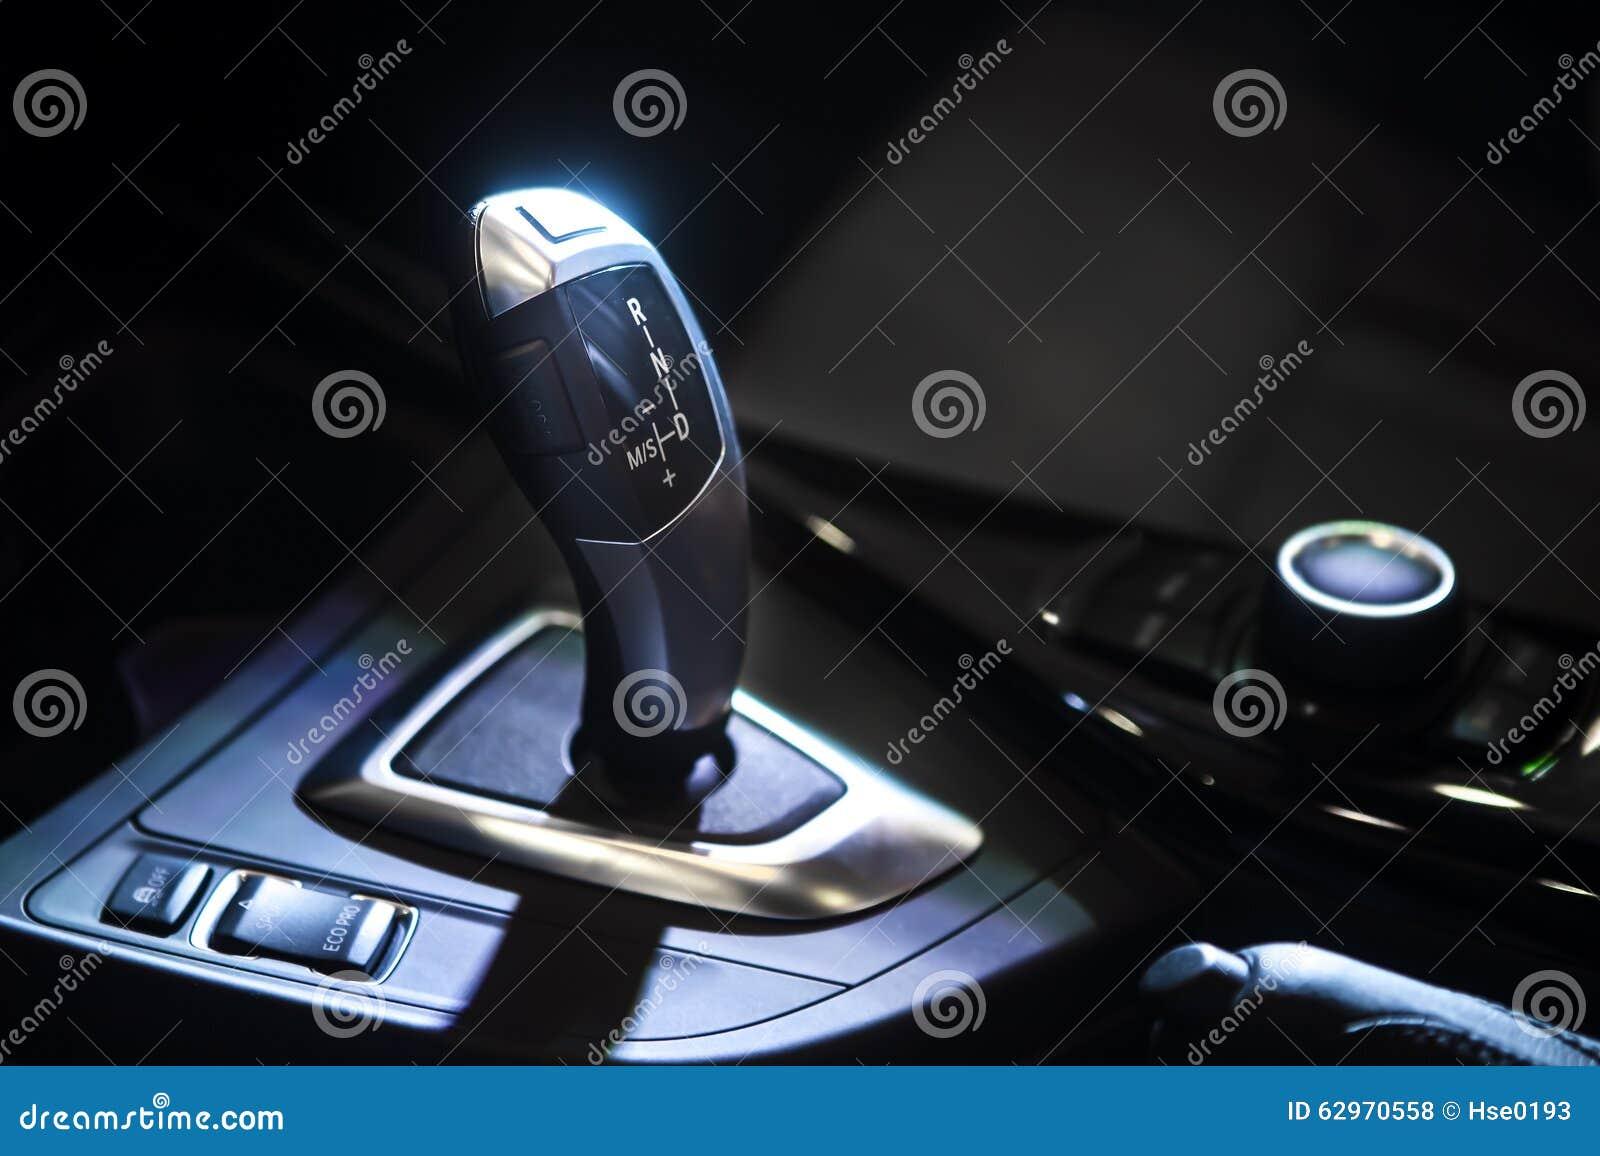 Automatic transmission shift gear